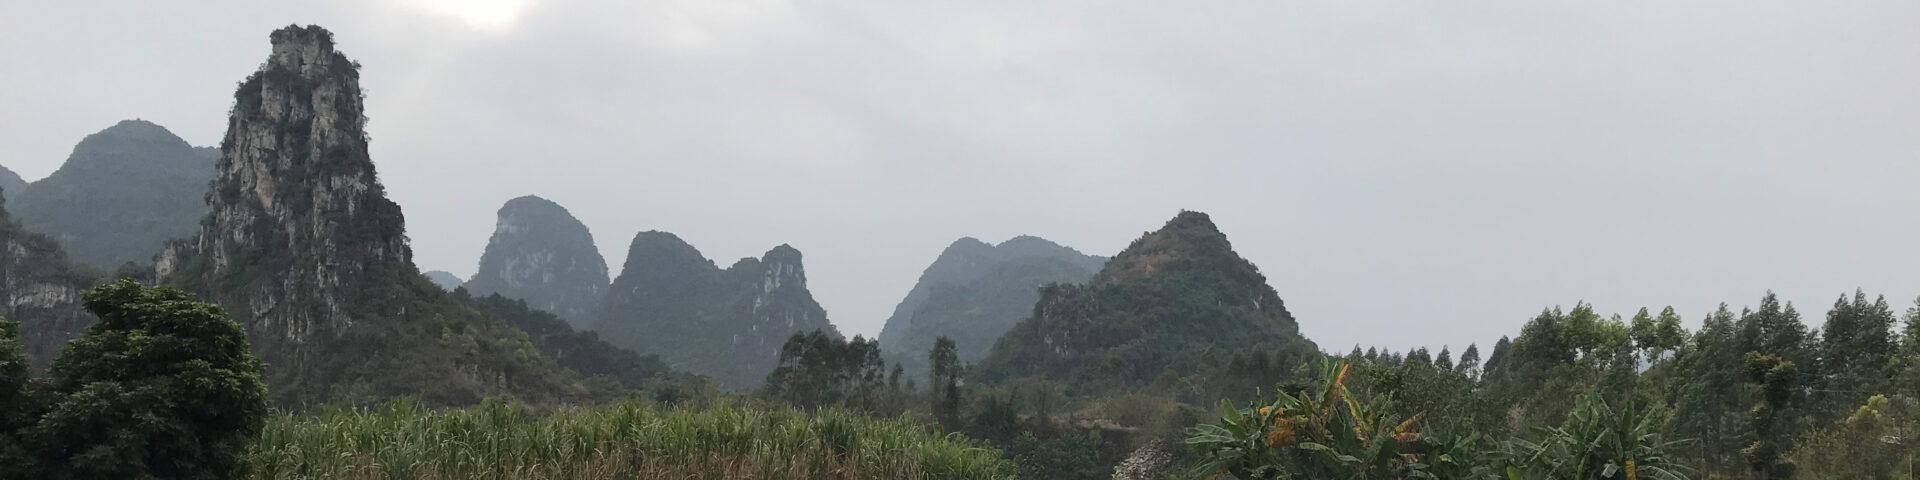 Wuxuan Skyline